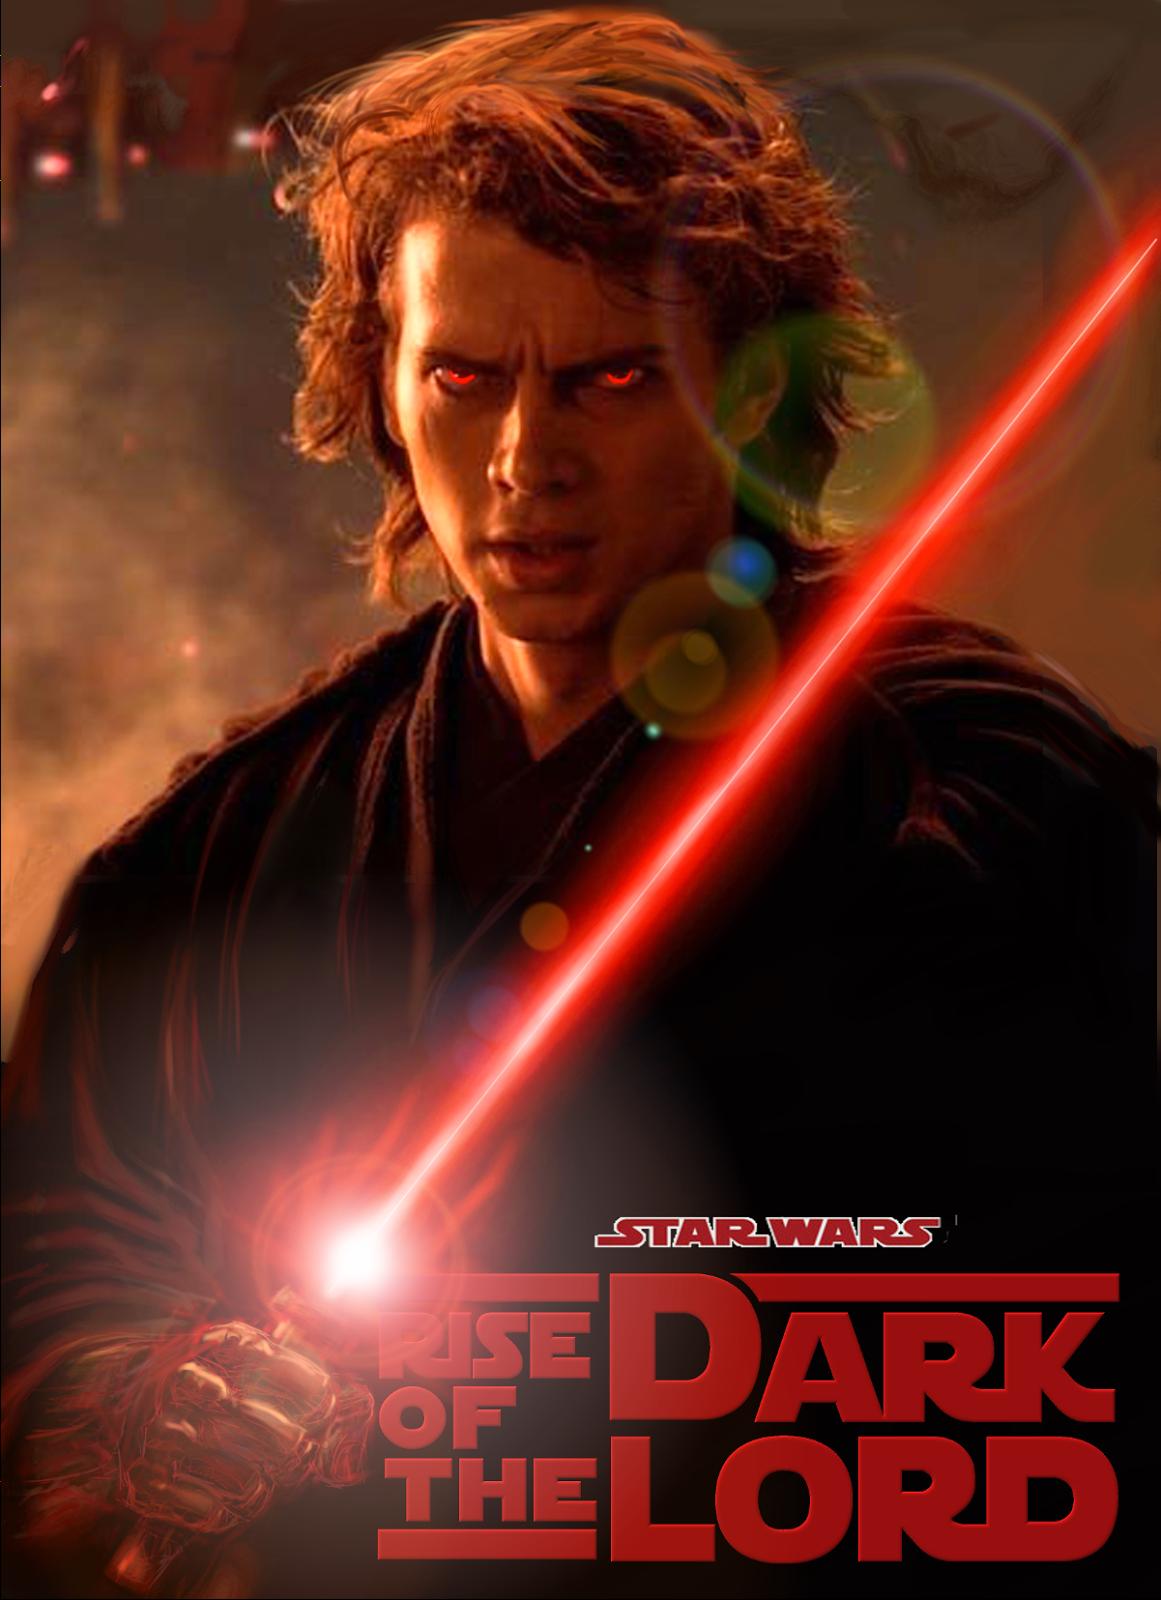 star wars prequels re write asian